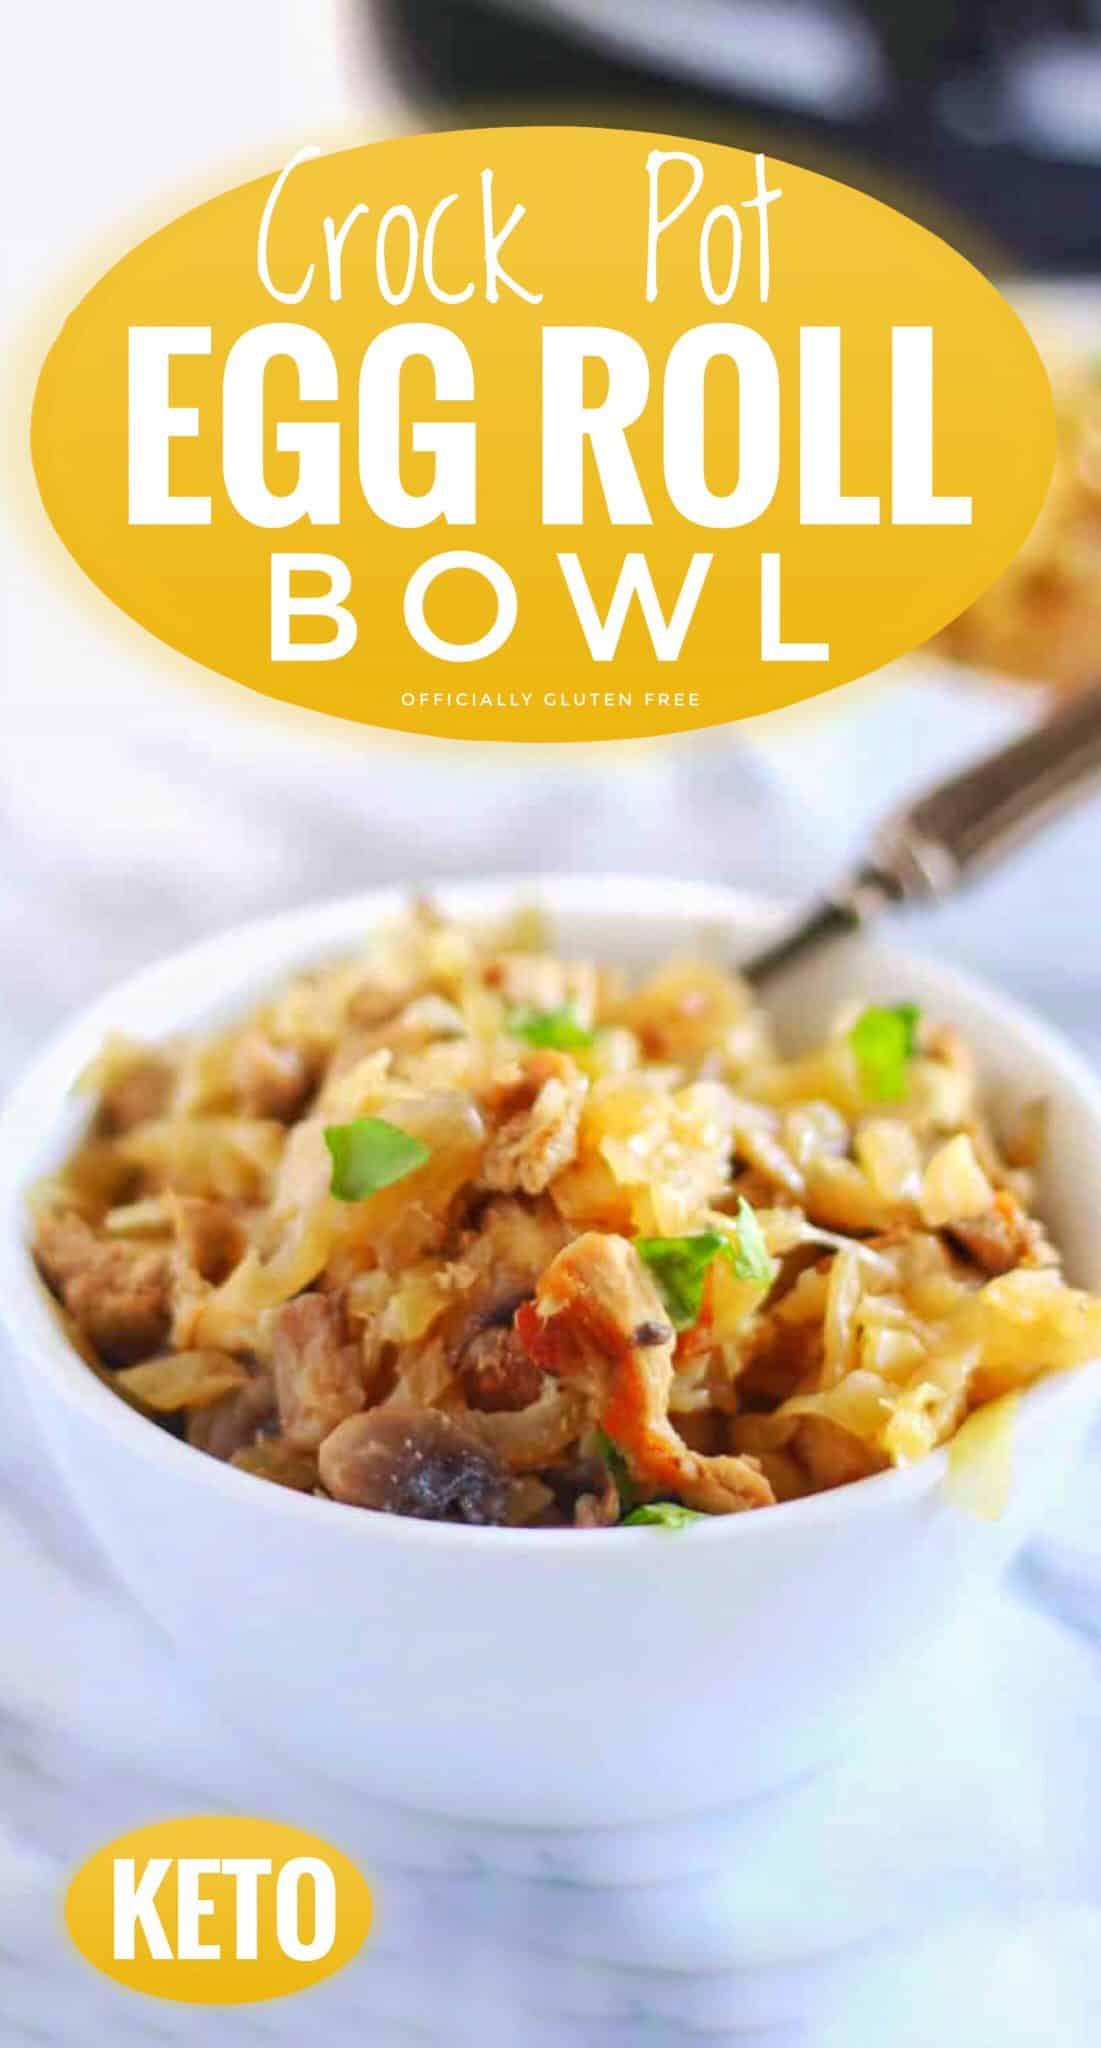 Crock Pot Egg Roll Bowl